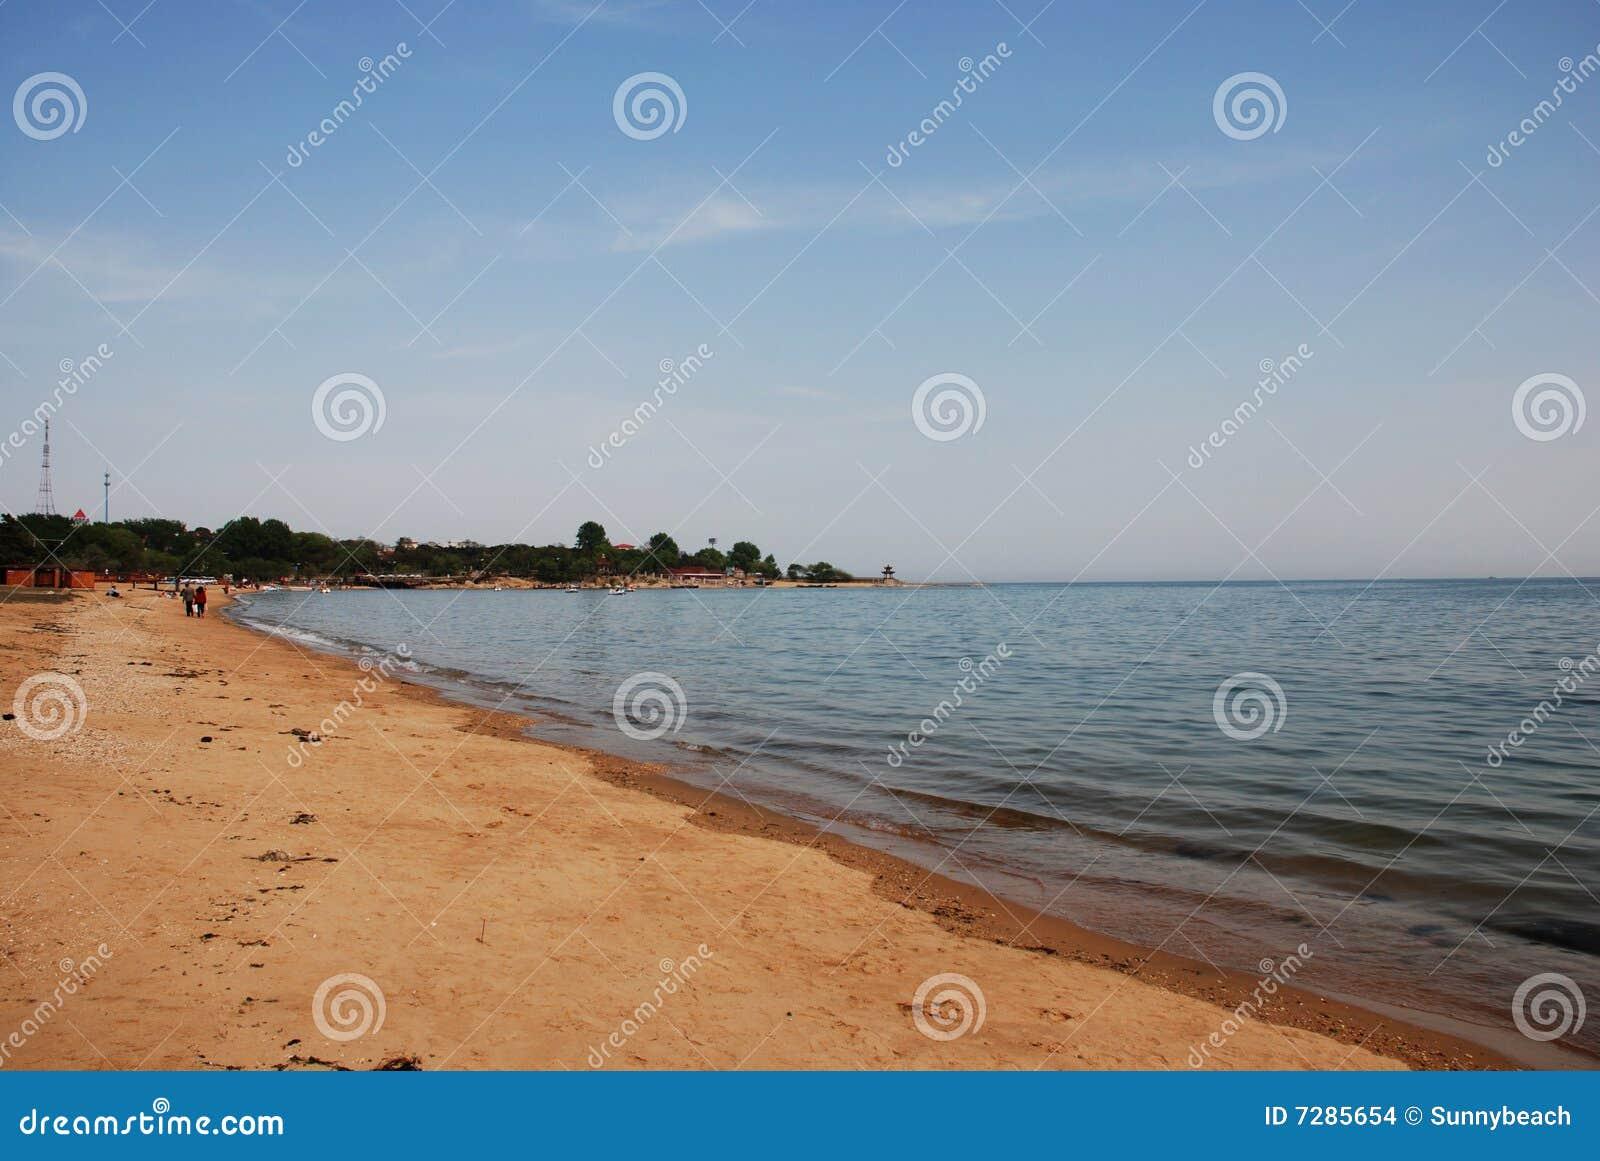 Resorte en la playa